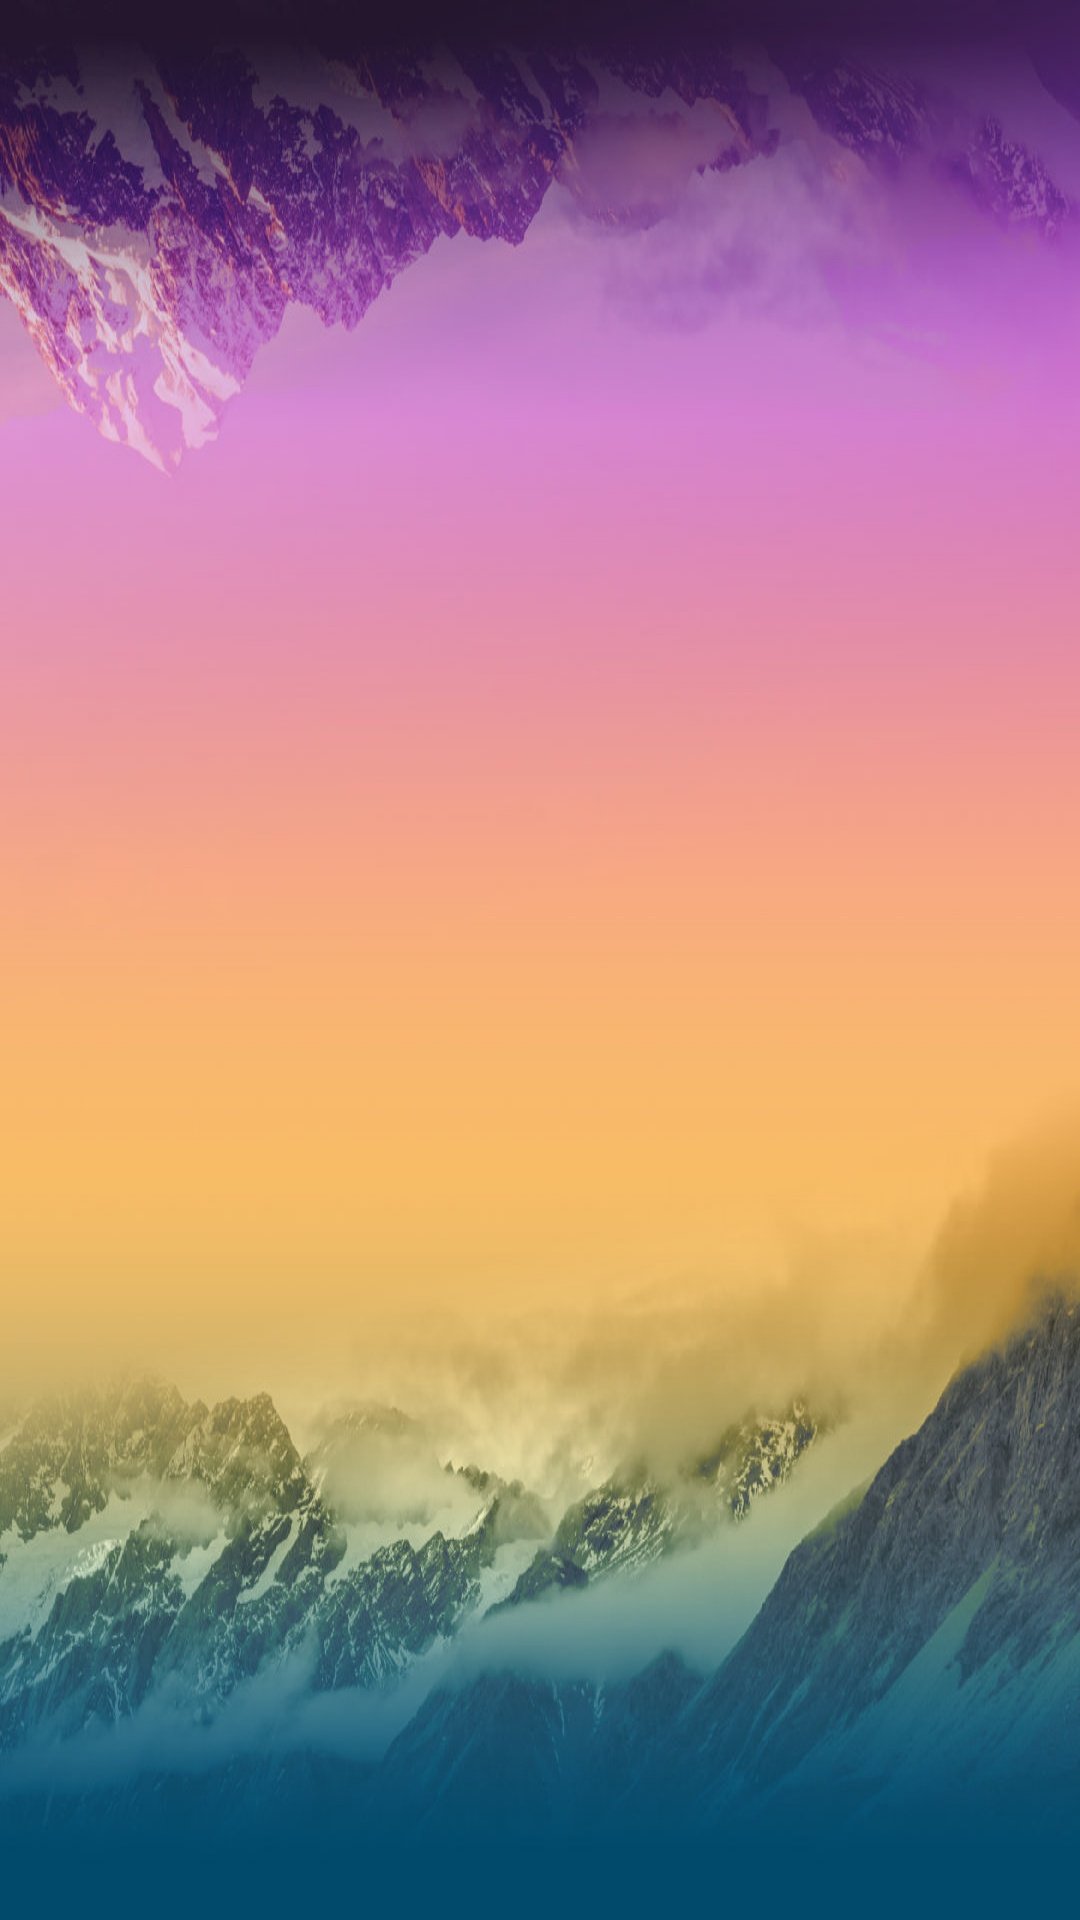 38 Samsung Galaxy M30 Wallpapers On Wallpapersafari